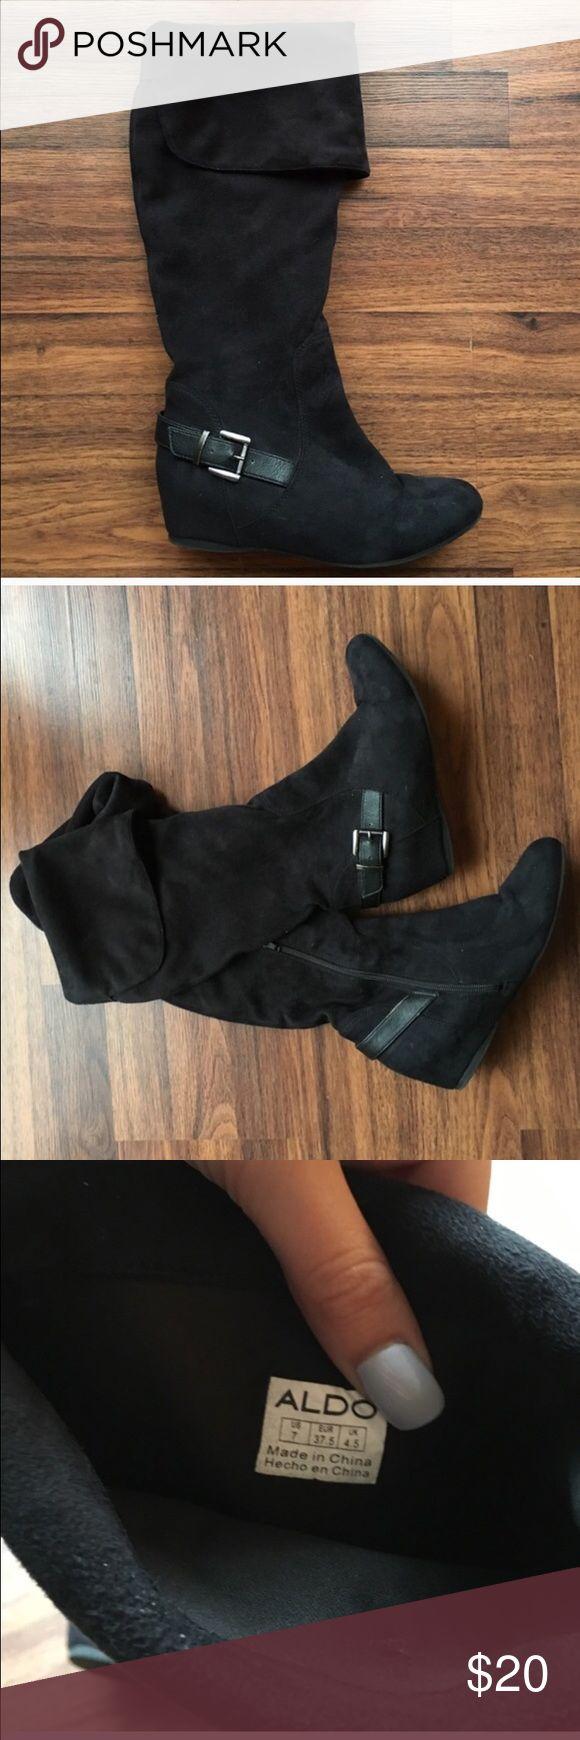 ALDO boots Great condition. Small wedge heel. Very comfy. Aldo Shoes